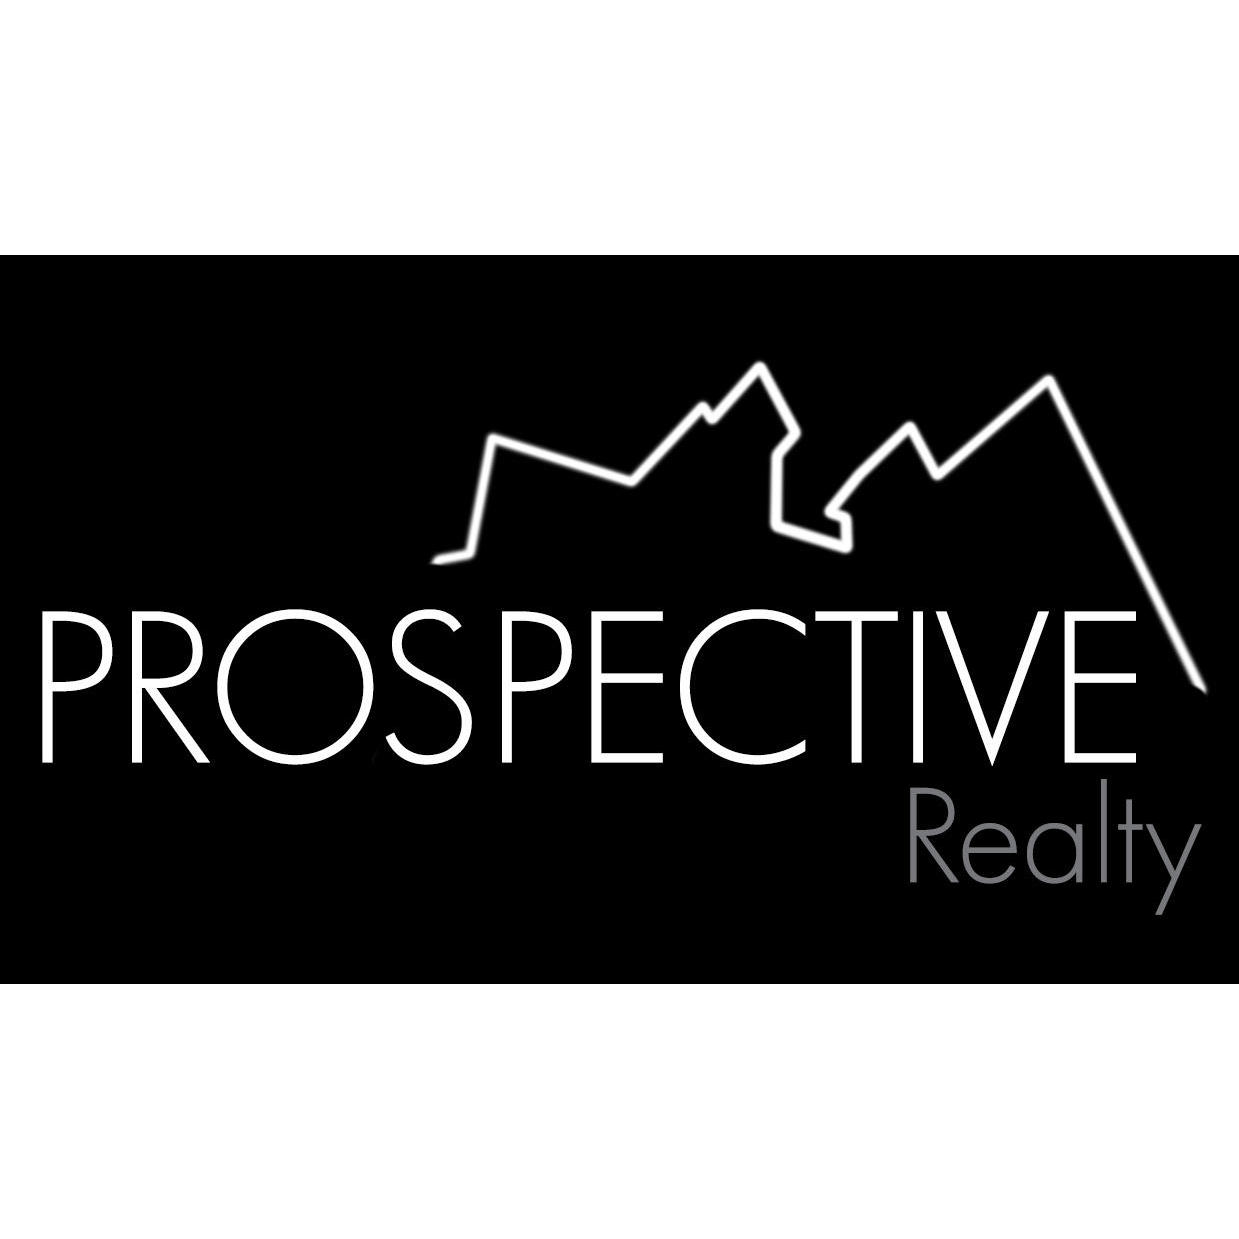 Robert Matewsky - Prospective Realty